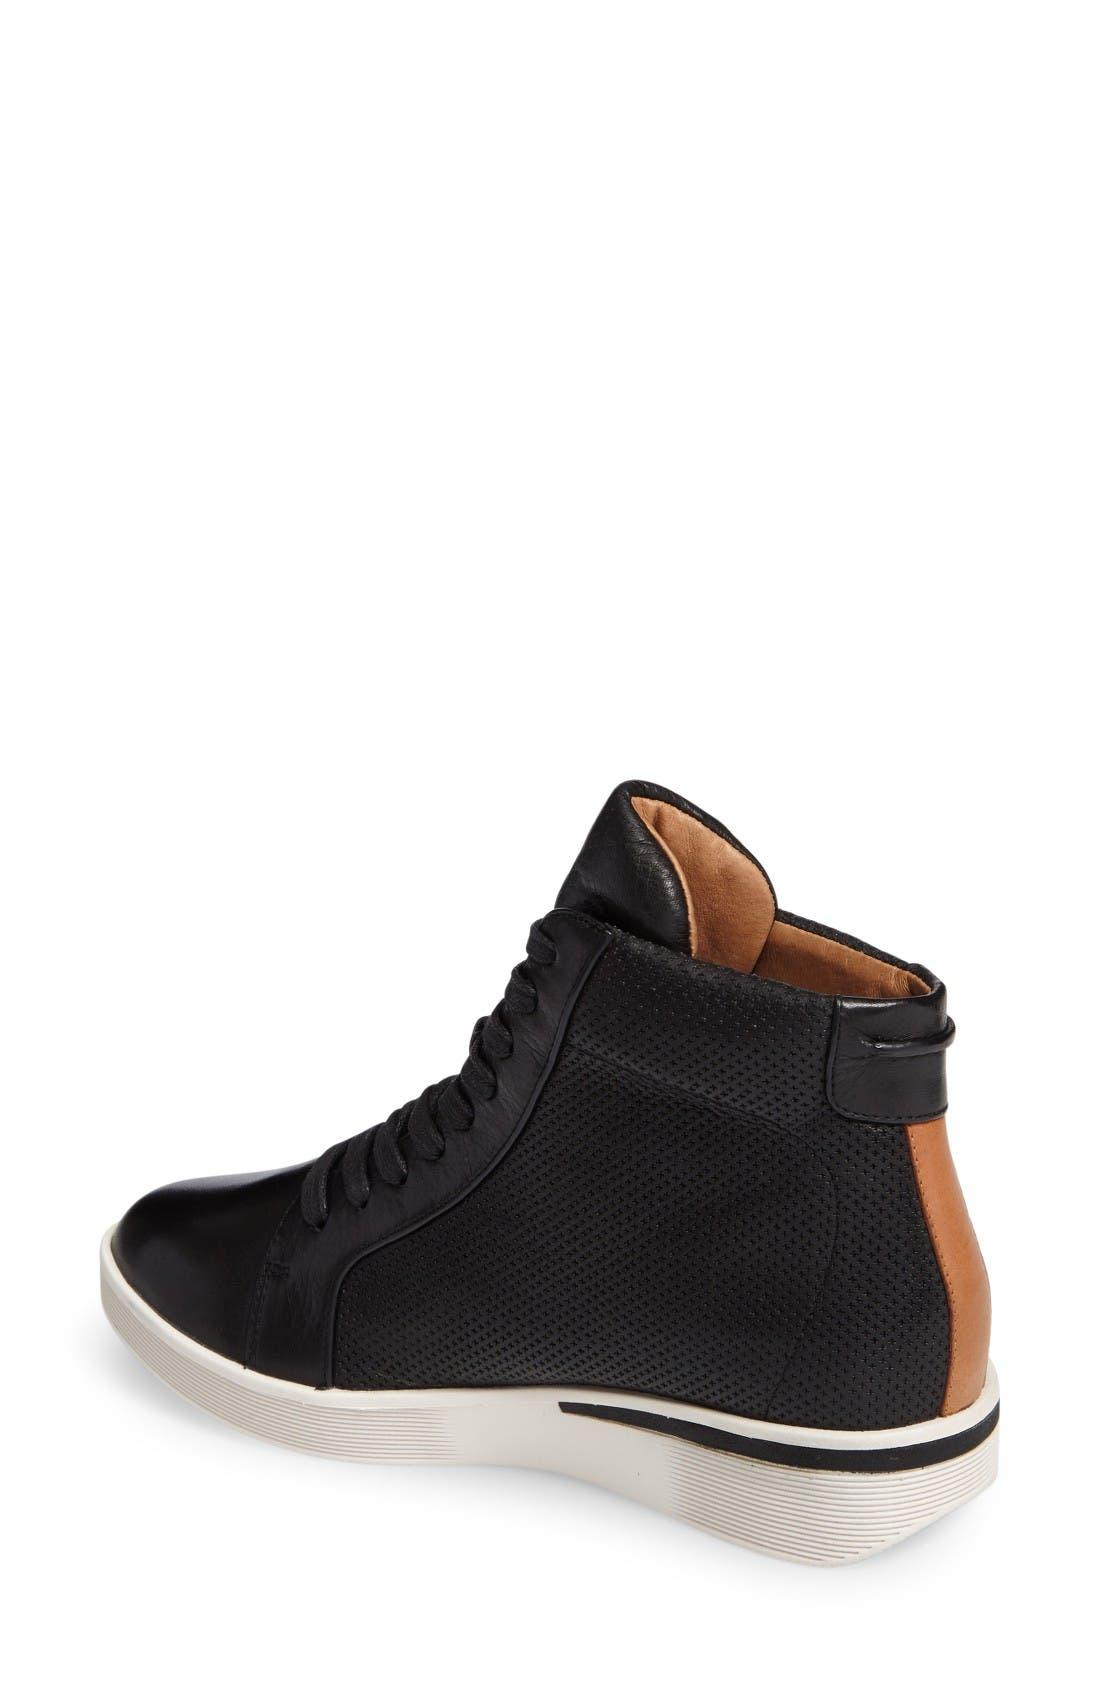 Helka High Top Sneaker,                             Alternate thumbnail 2, color,                             Black Leather